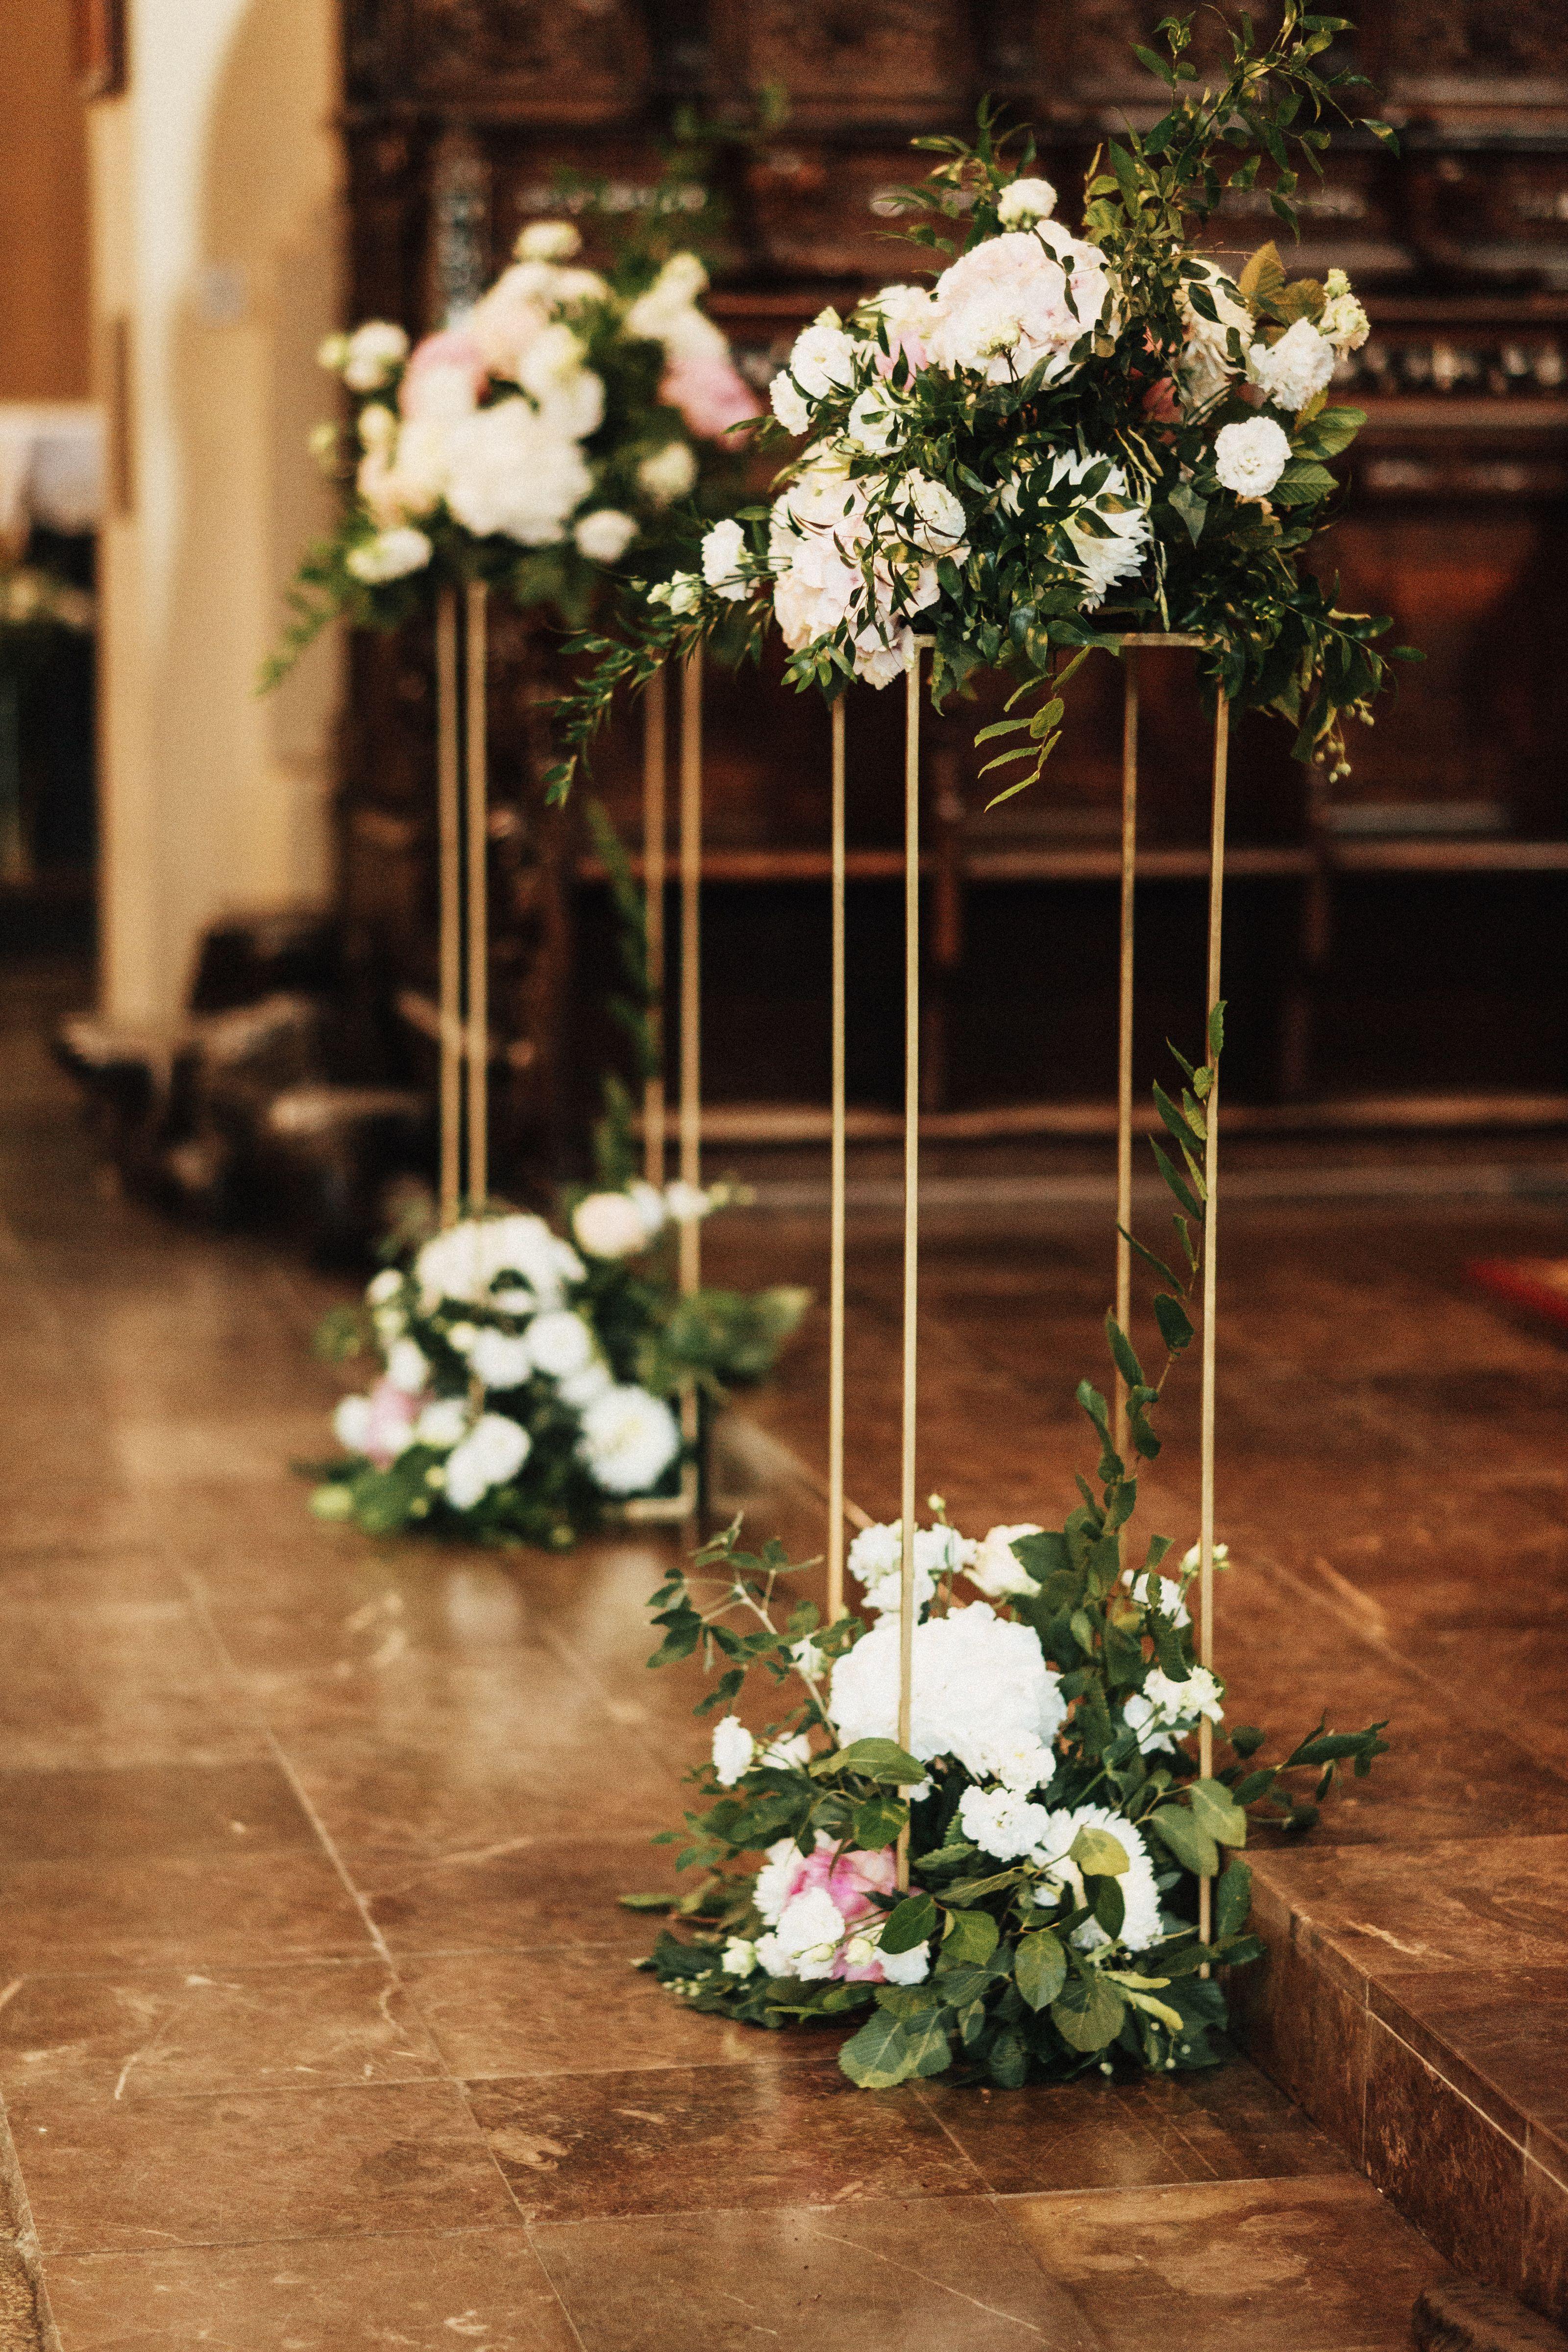 Inna Studio Church Decoration For The Wedding Flowers For The Church Altar Decoratio In 2020 Church Wedding Flowers Altar Altar Flowers Wedding Church Wedding Flowers